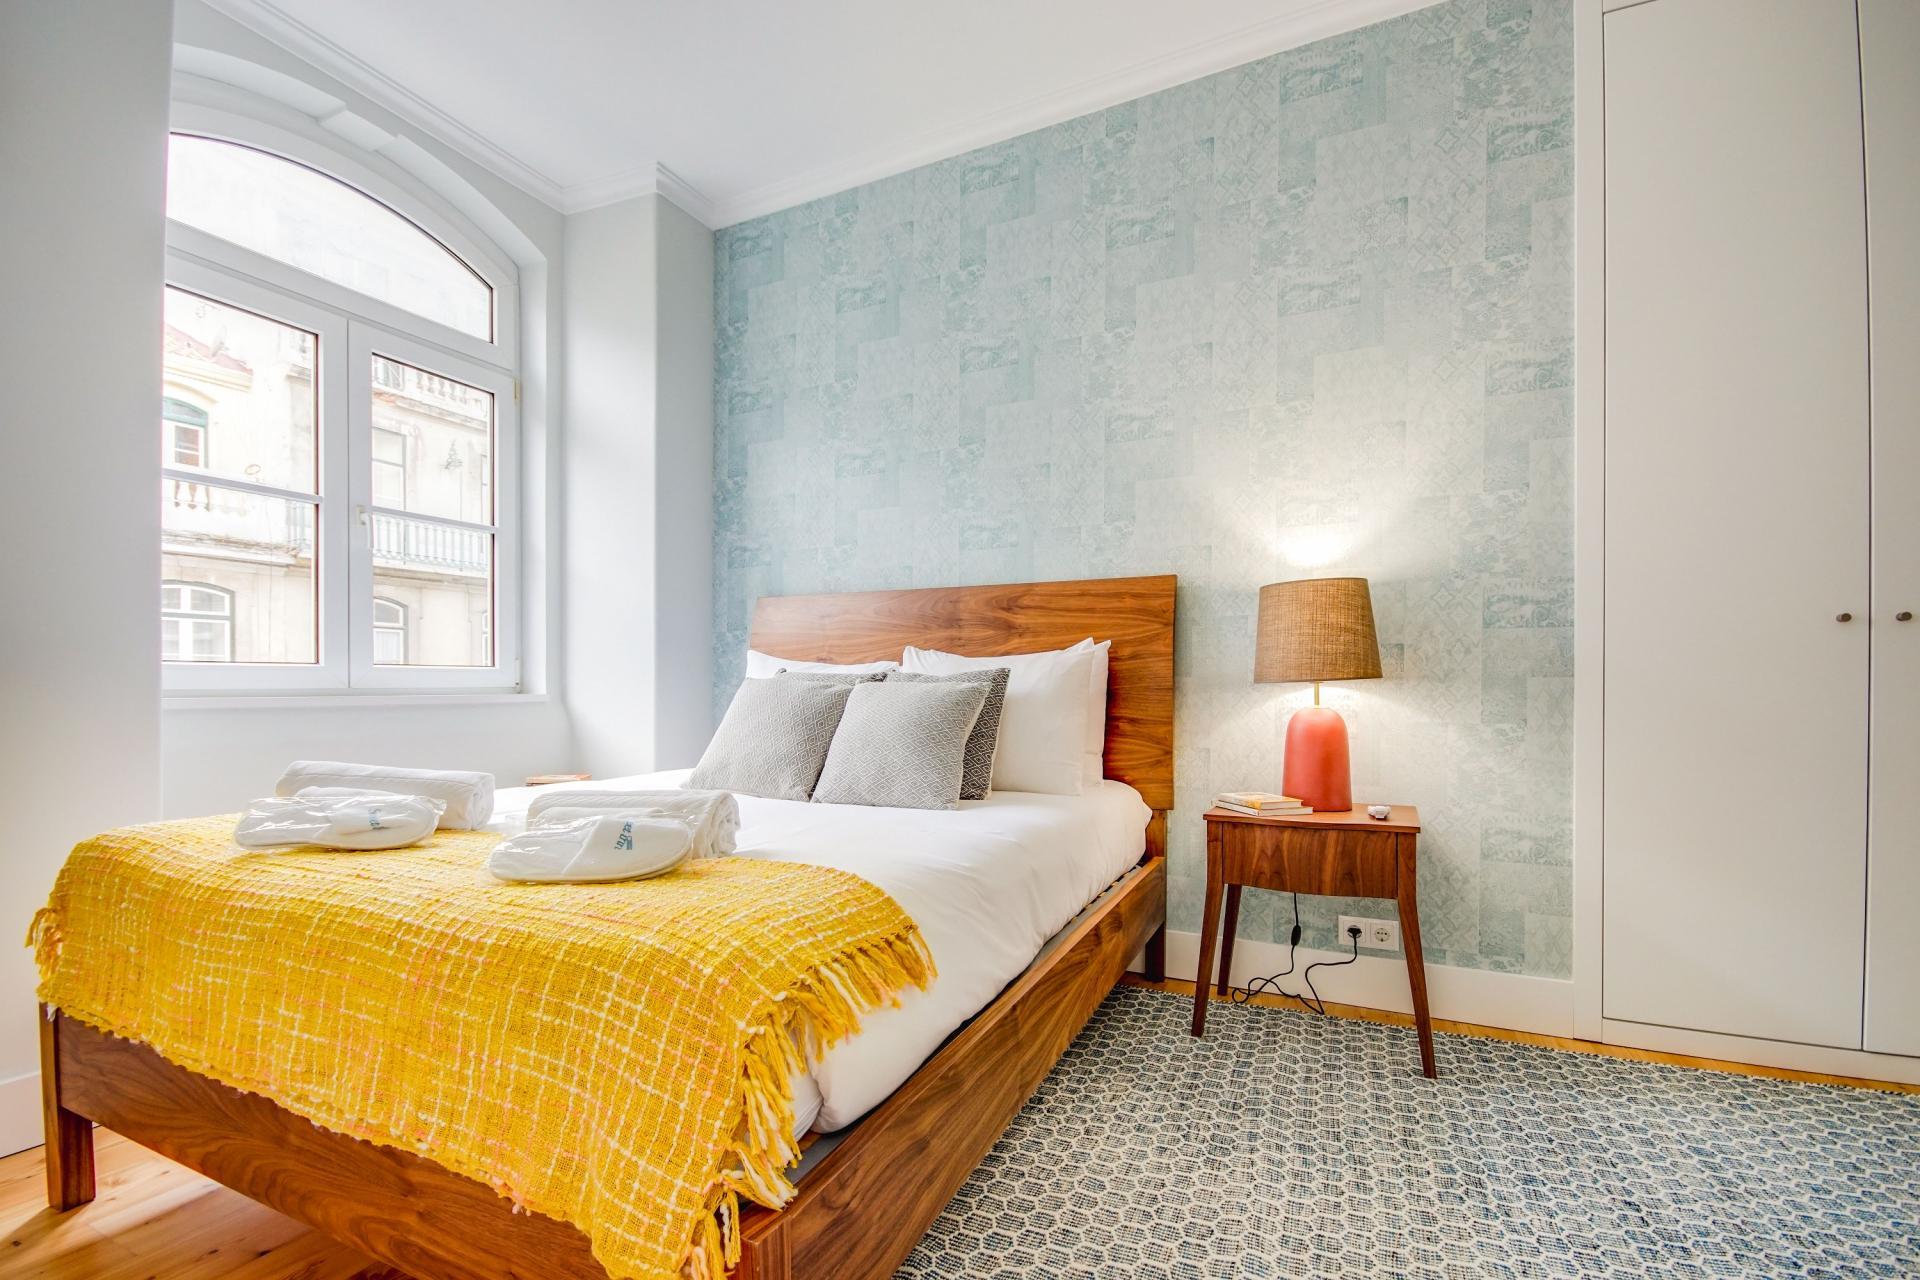 Double room at Prata Apartments - Citybase Apartments